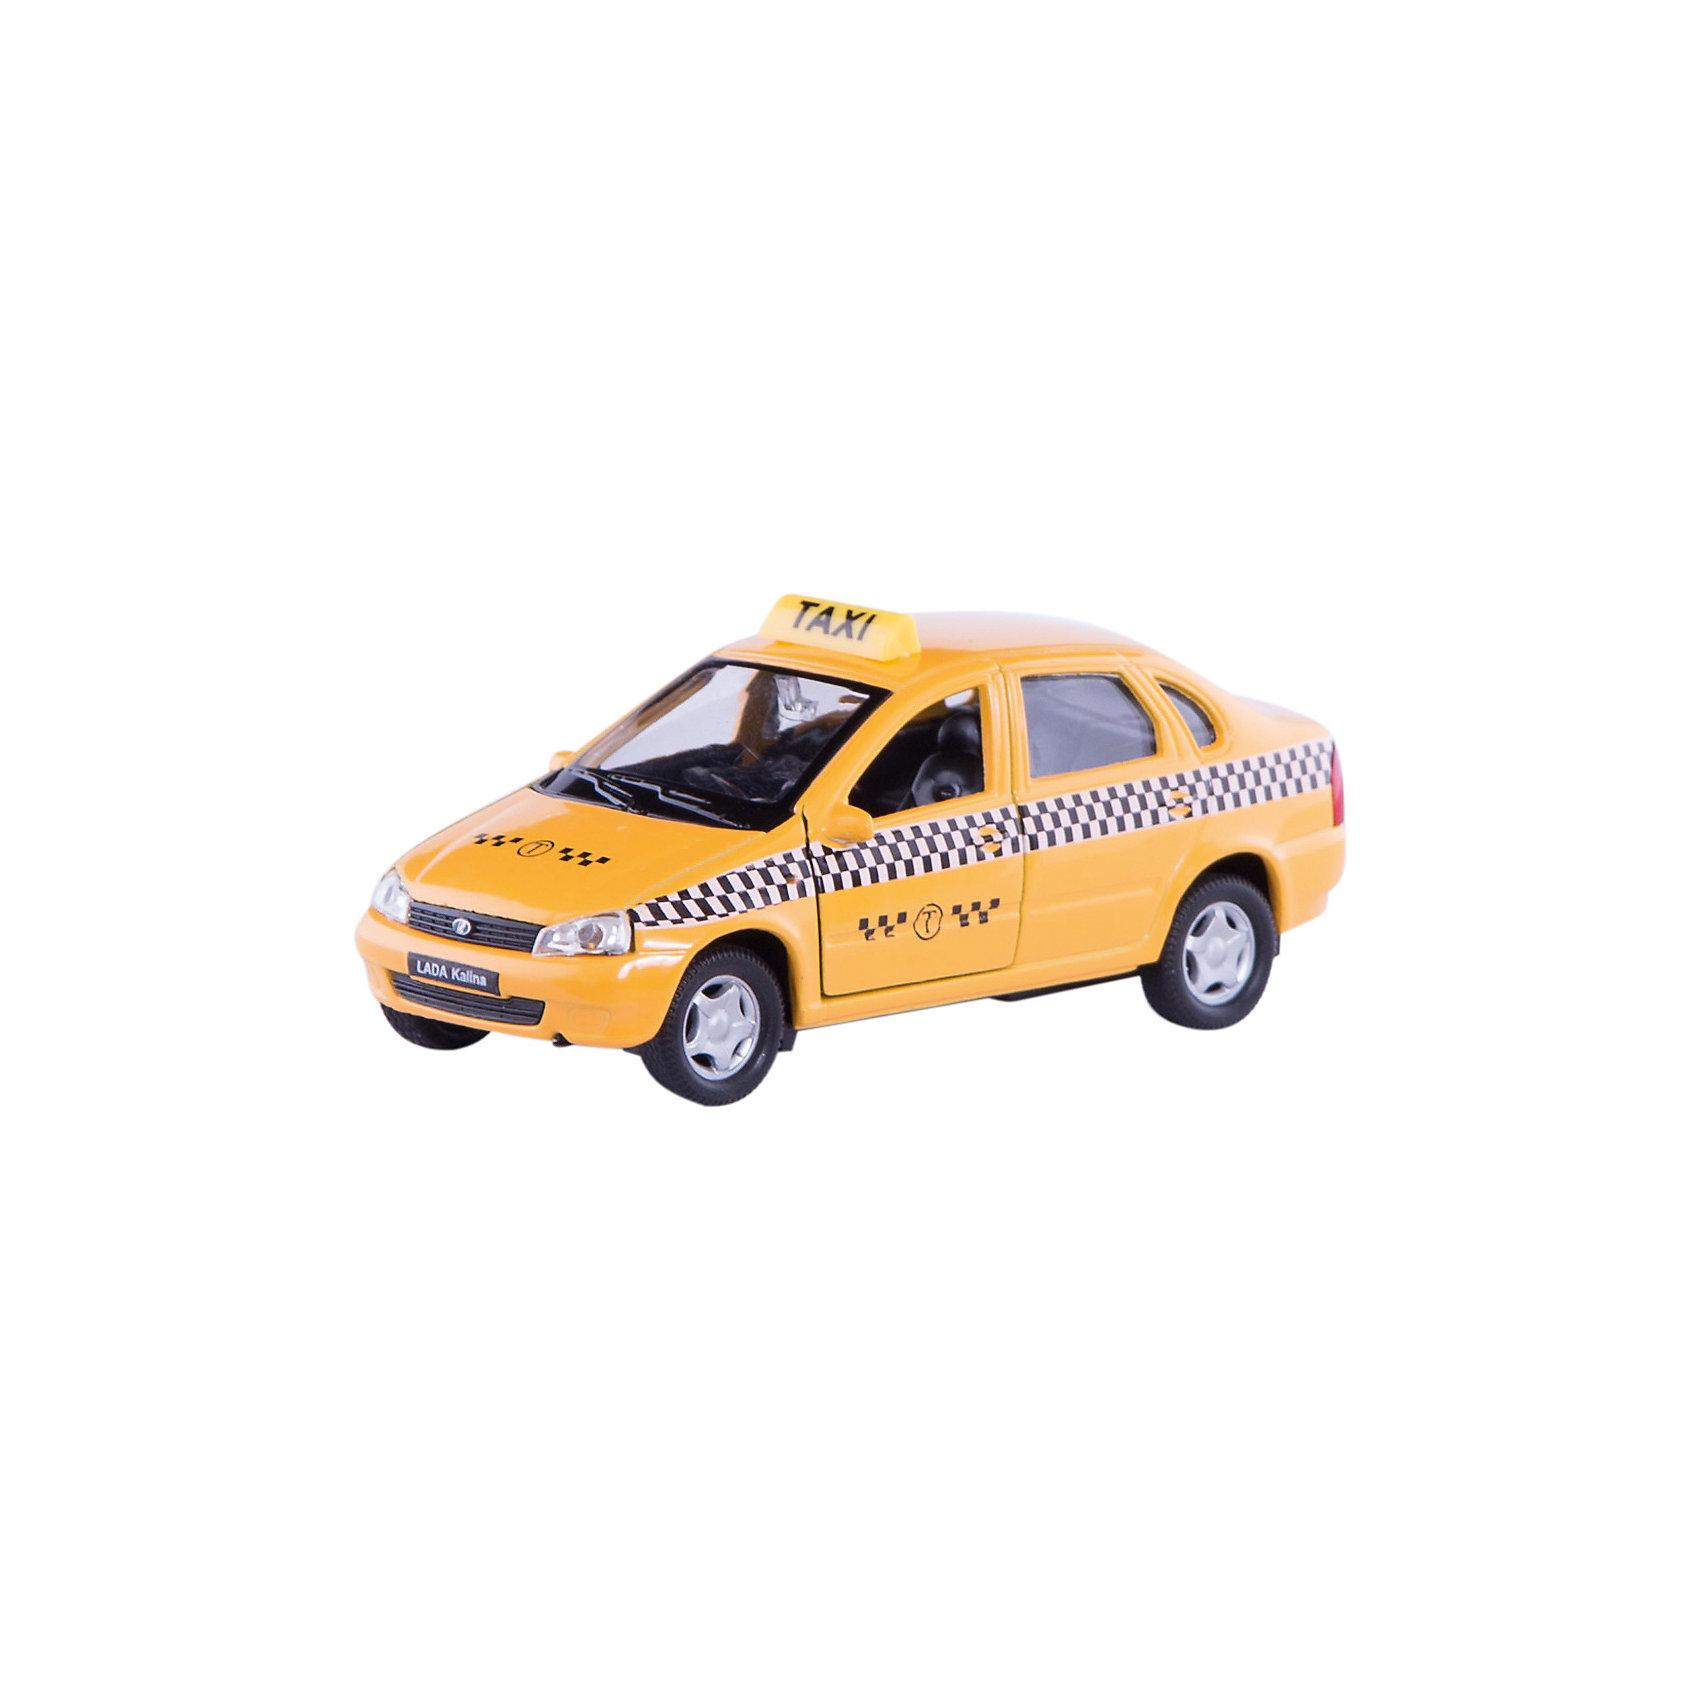 Welly Welly Модель машины 1:34-39 LADA Kalina Такси welly 42377ry велли модель машины 1 34 39 lada 2108 rally